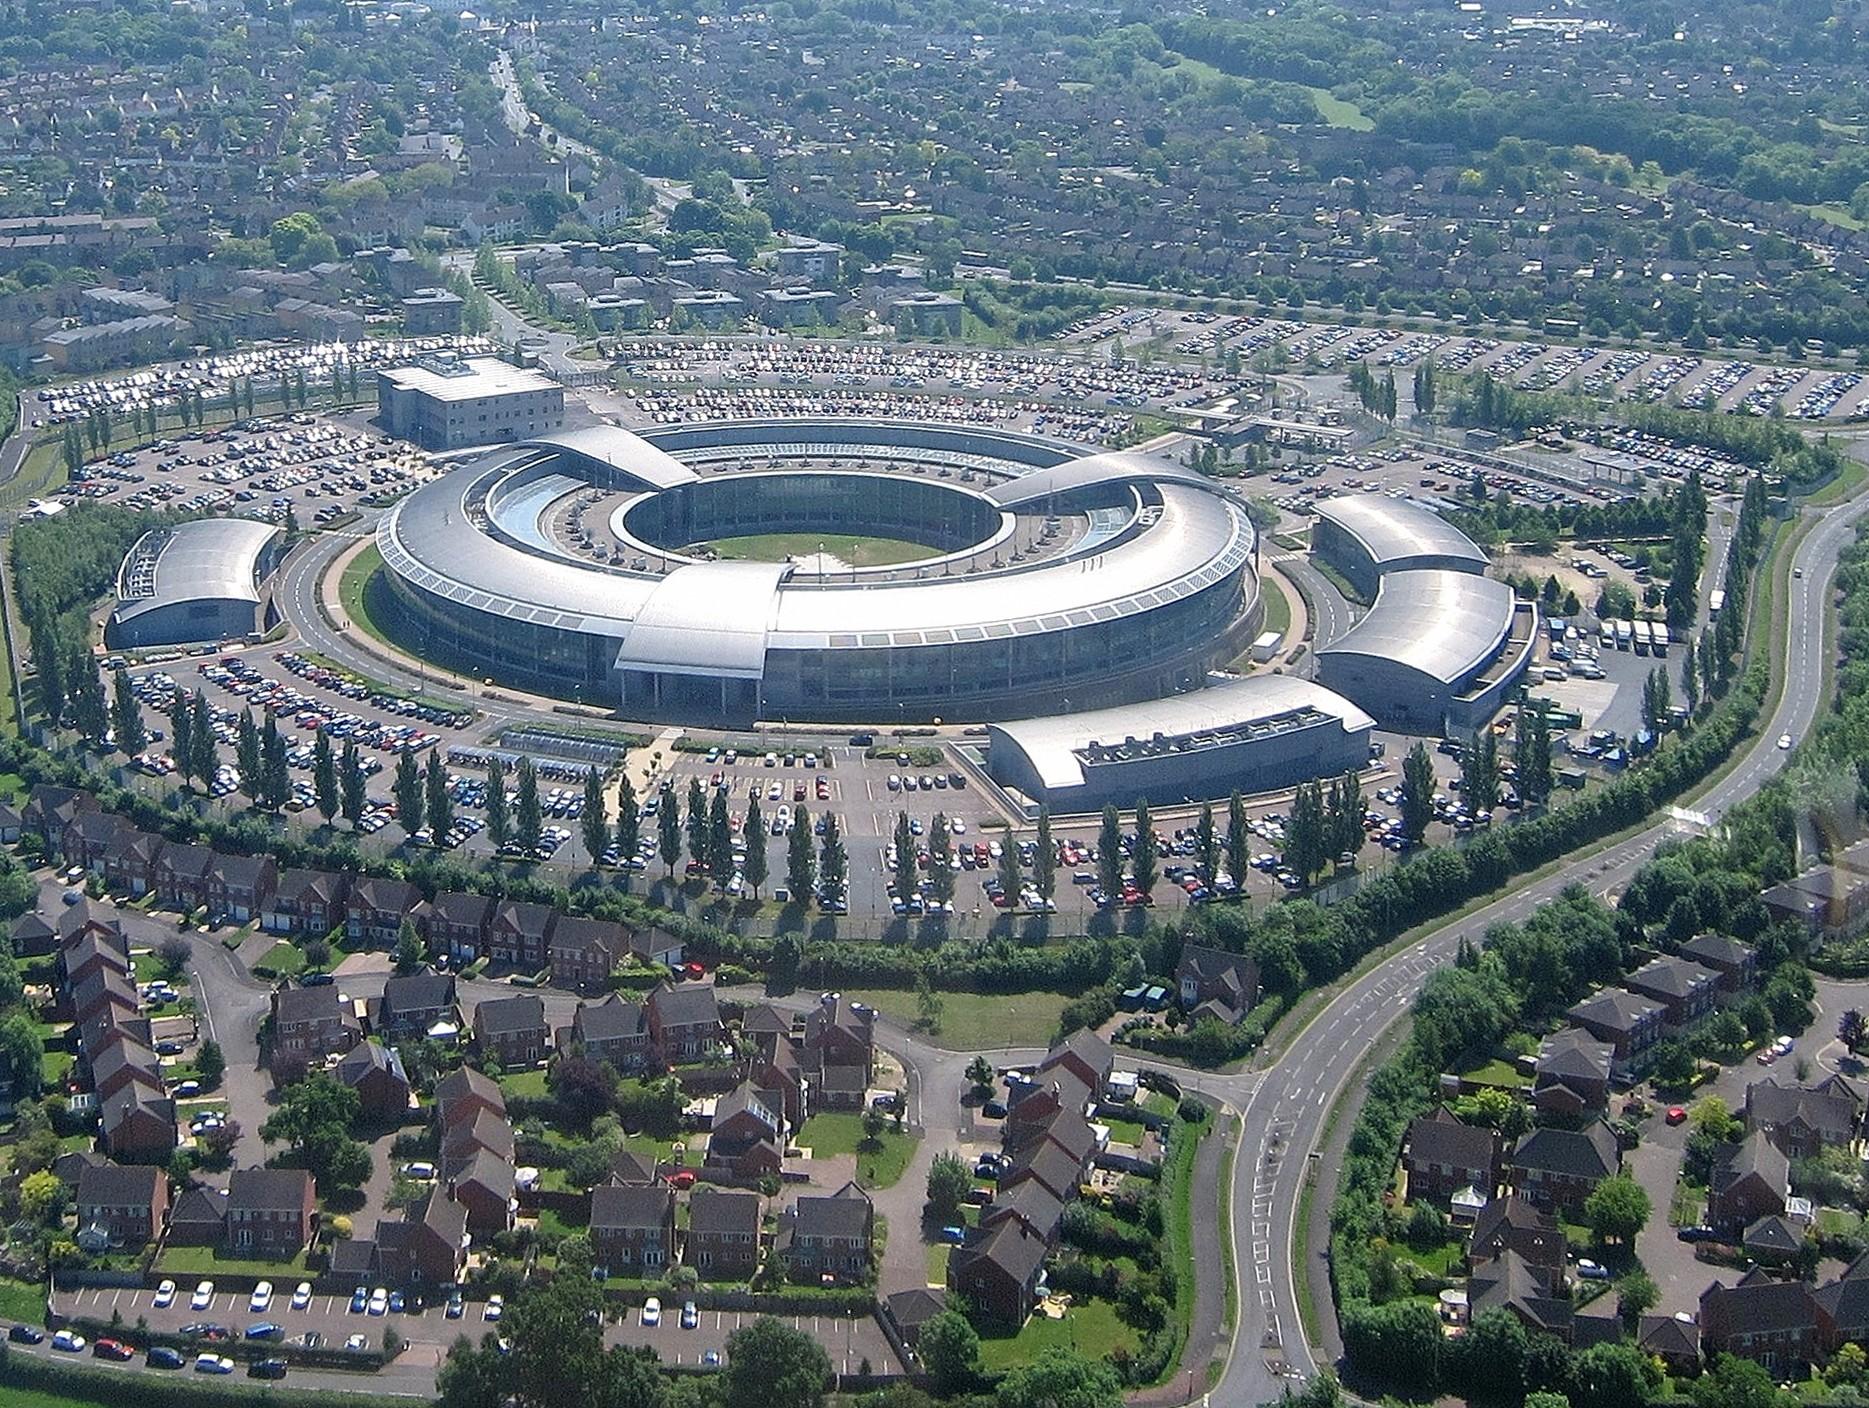 Aerial_of_GCHQ,_Cheltenham,_Gloucestershire,_England_24May2017_arp.jpg